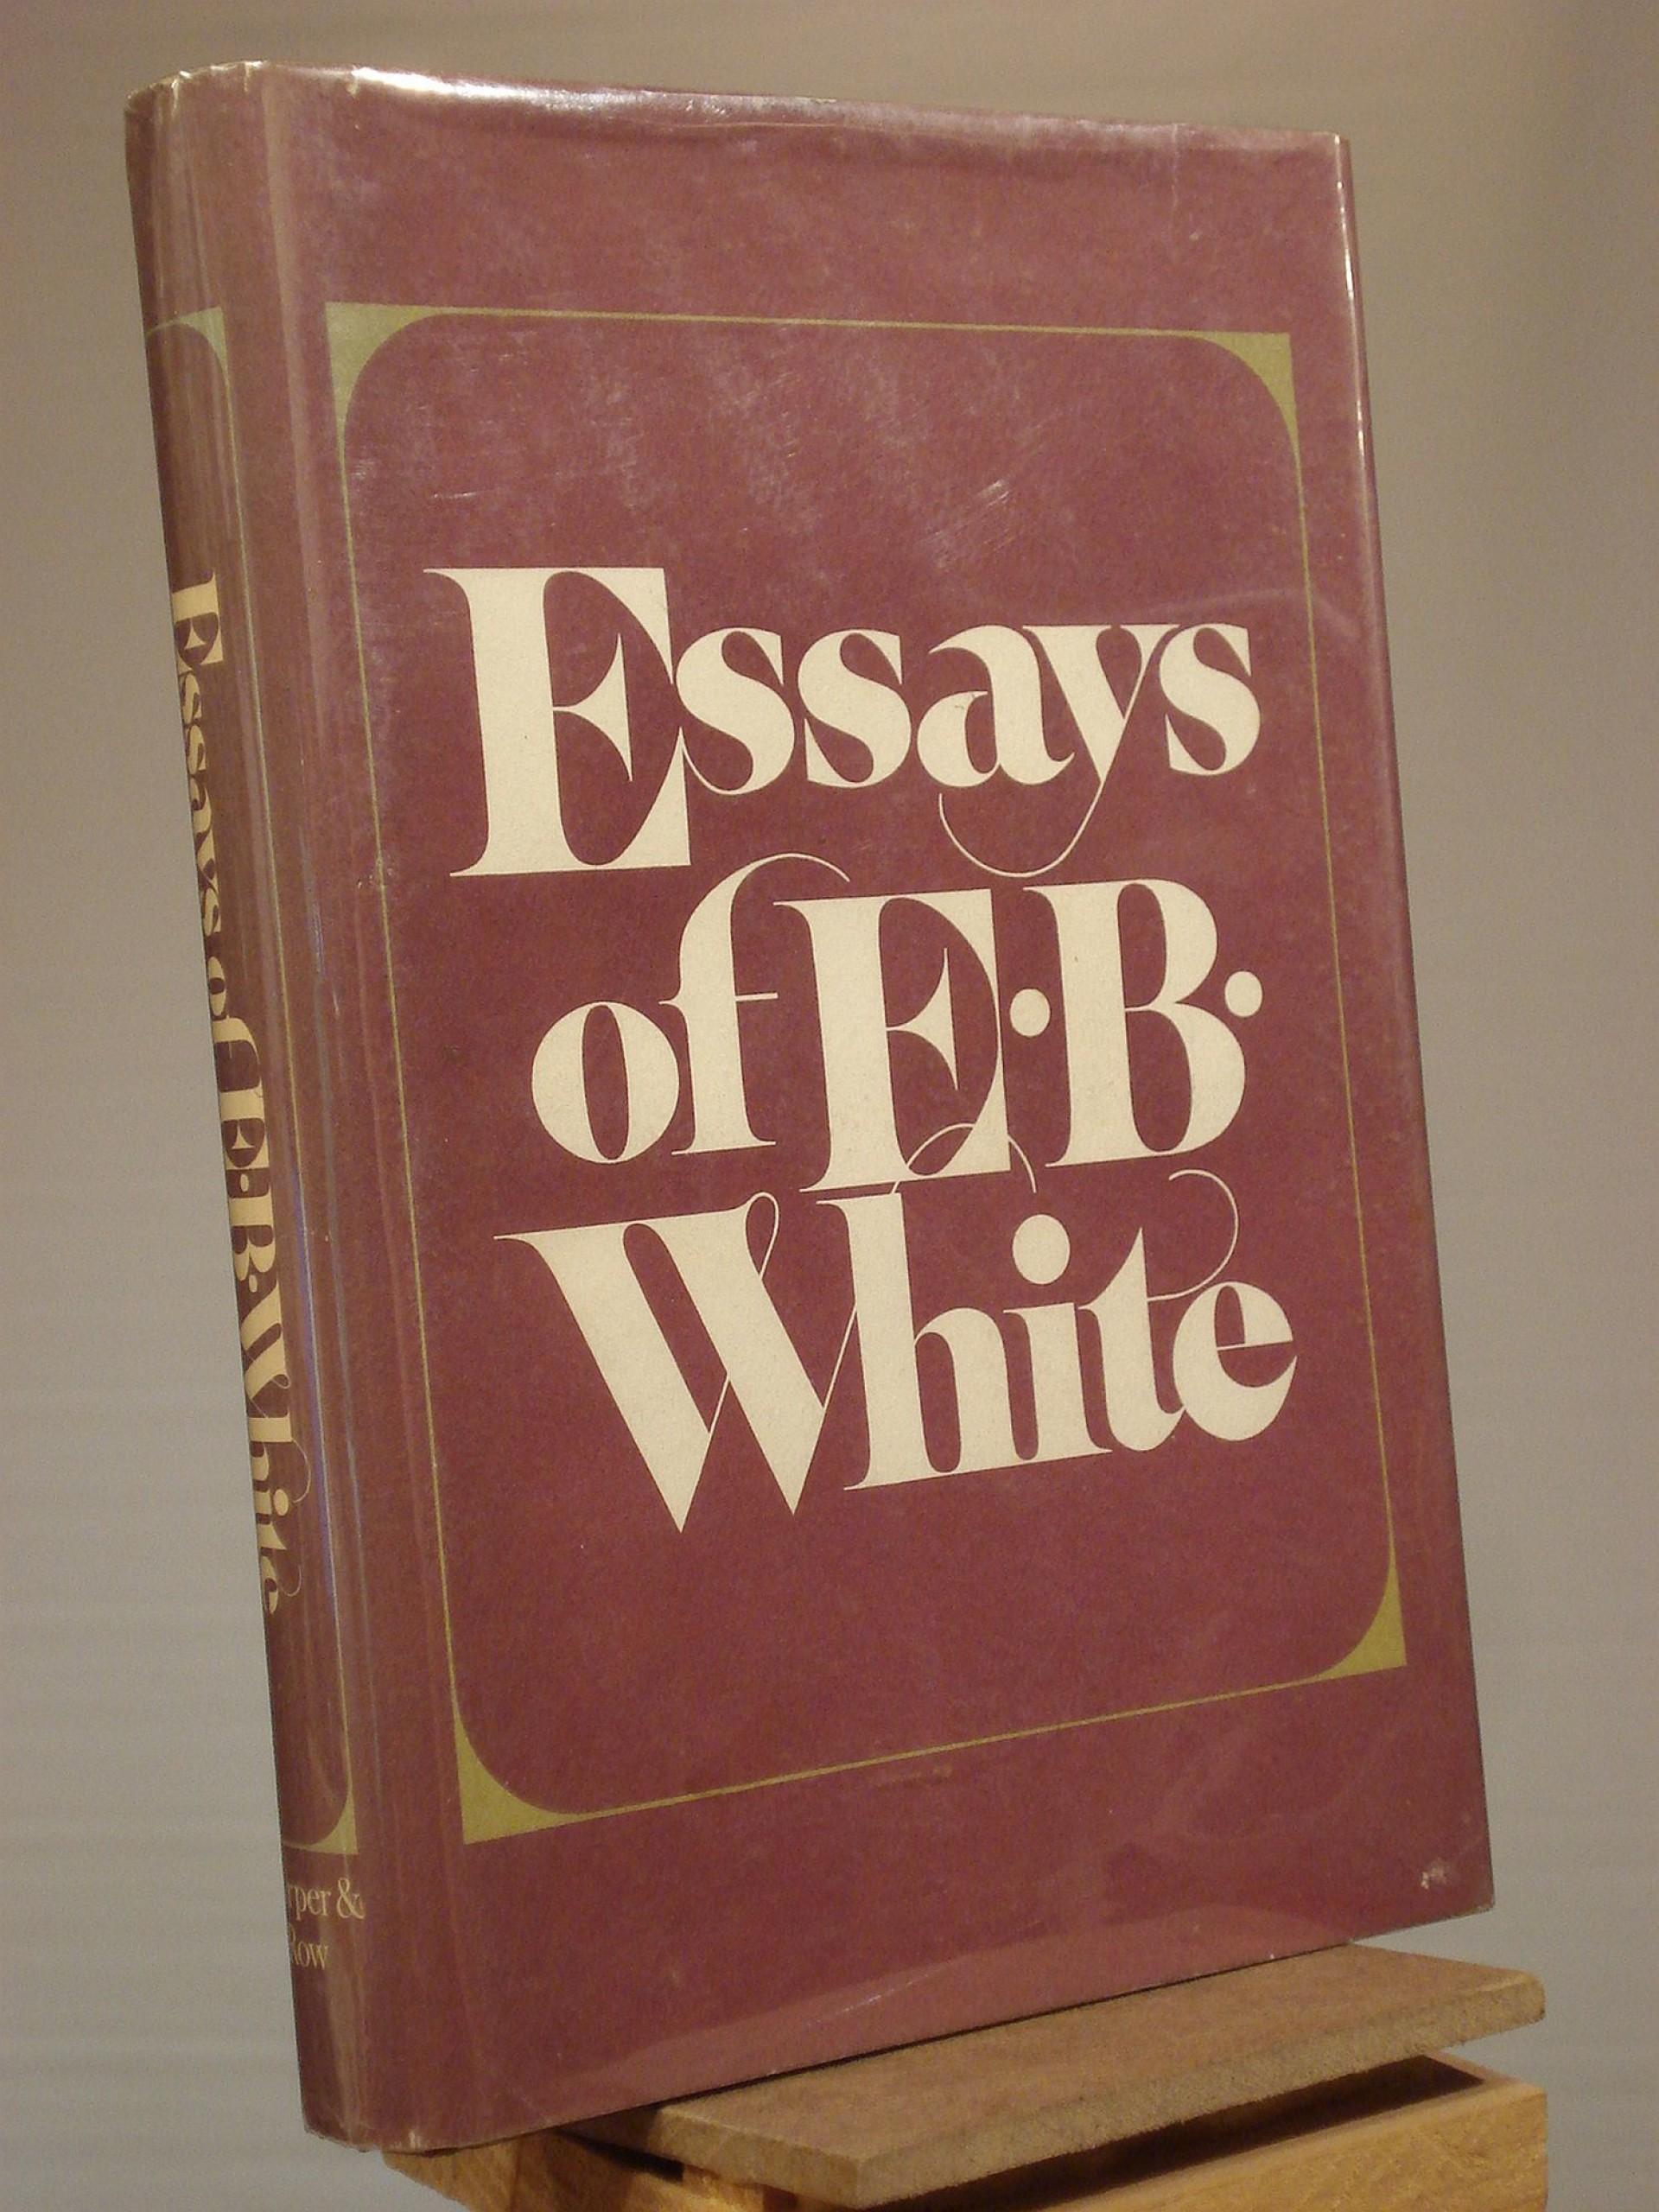 007 X White Essays Essay Unusual Eb Summary Online Pdf 1920